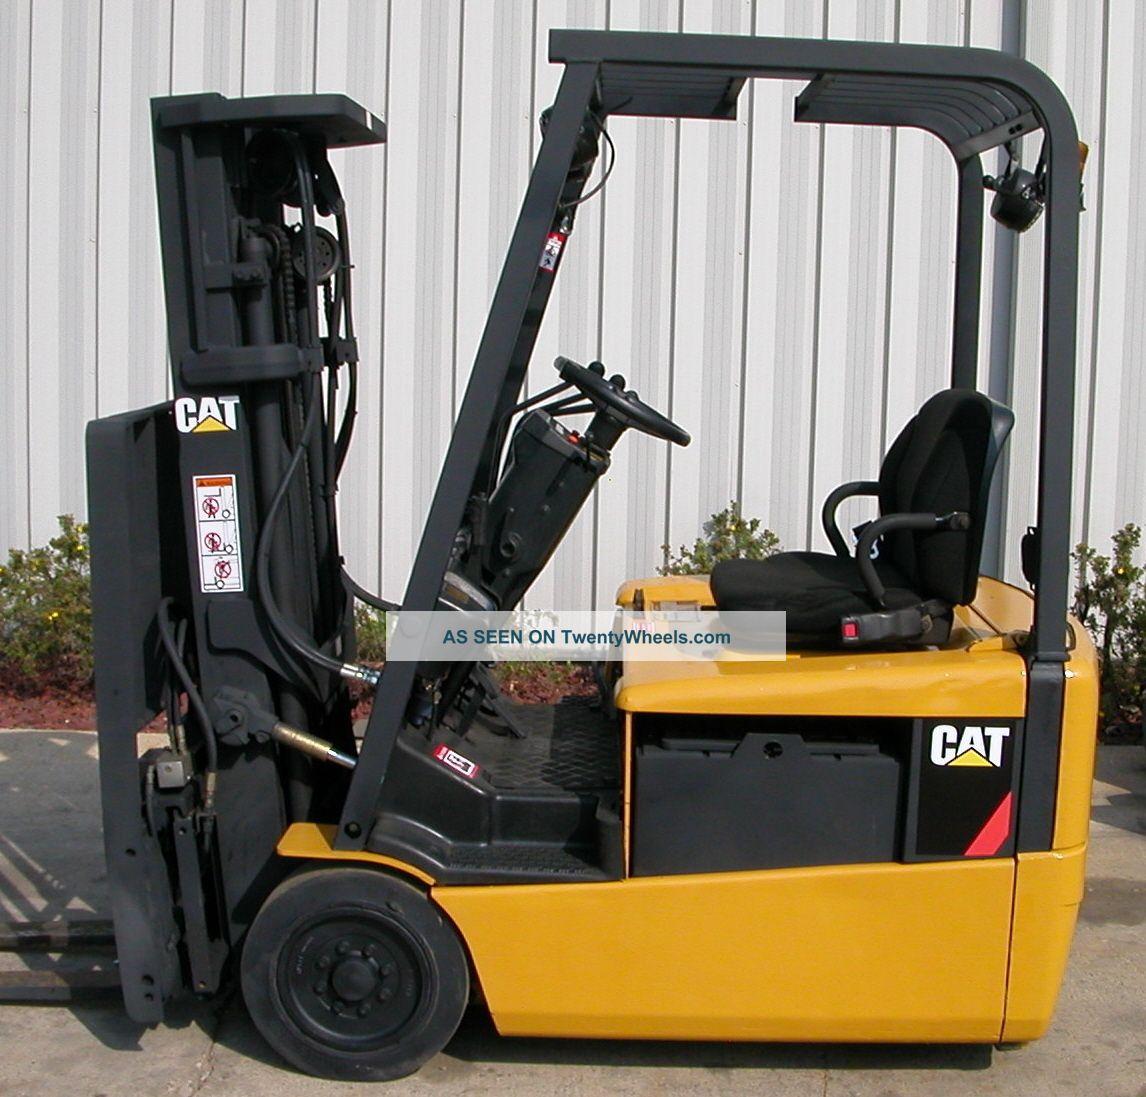 Caterpillar Model Ep16kt (2000) 3000 Lbs Capacity Electric 3 Wheel